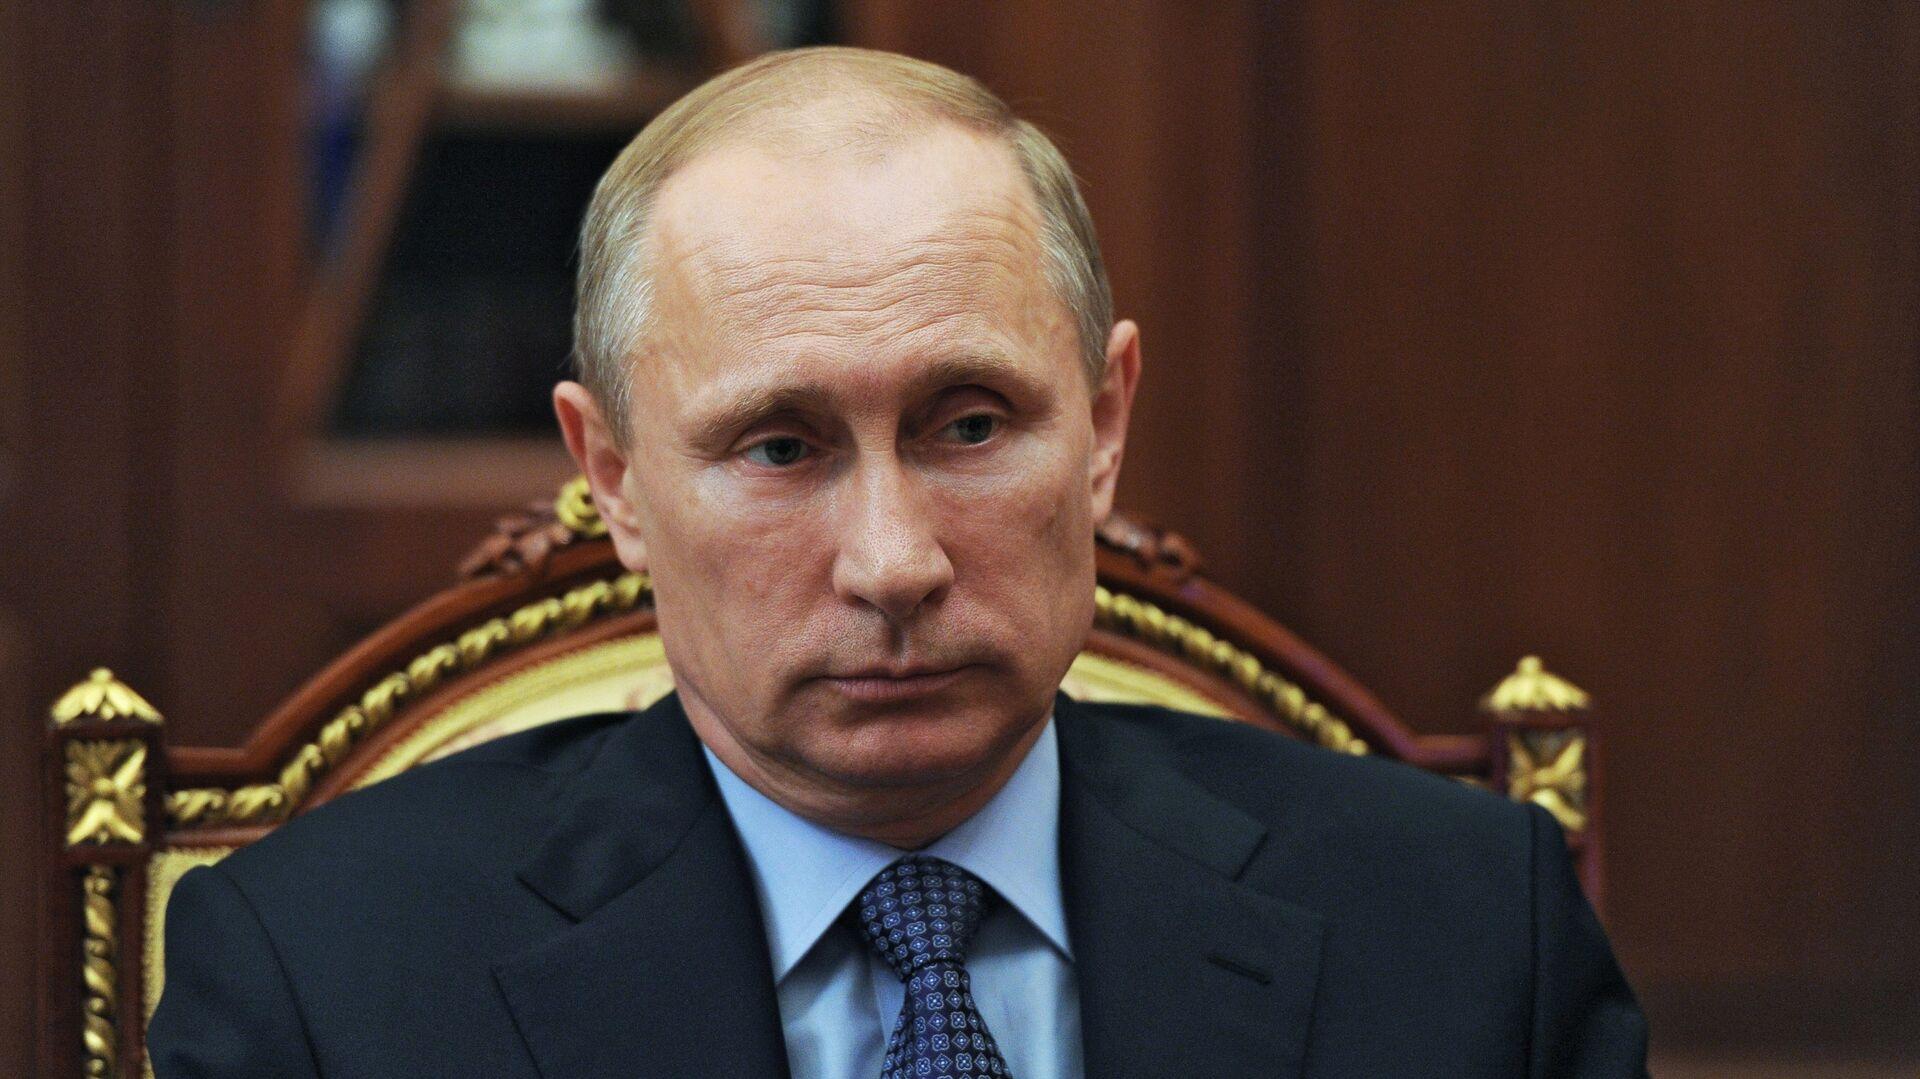 1010625341 0:24:3077:1754 1920x0 80 0 0 a1fd9a864a491fcf1e3884921b021bf3 - Песков рассказал о подготовке встречи Путина с лидерами думских фракций